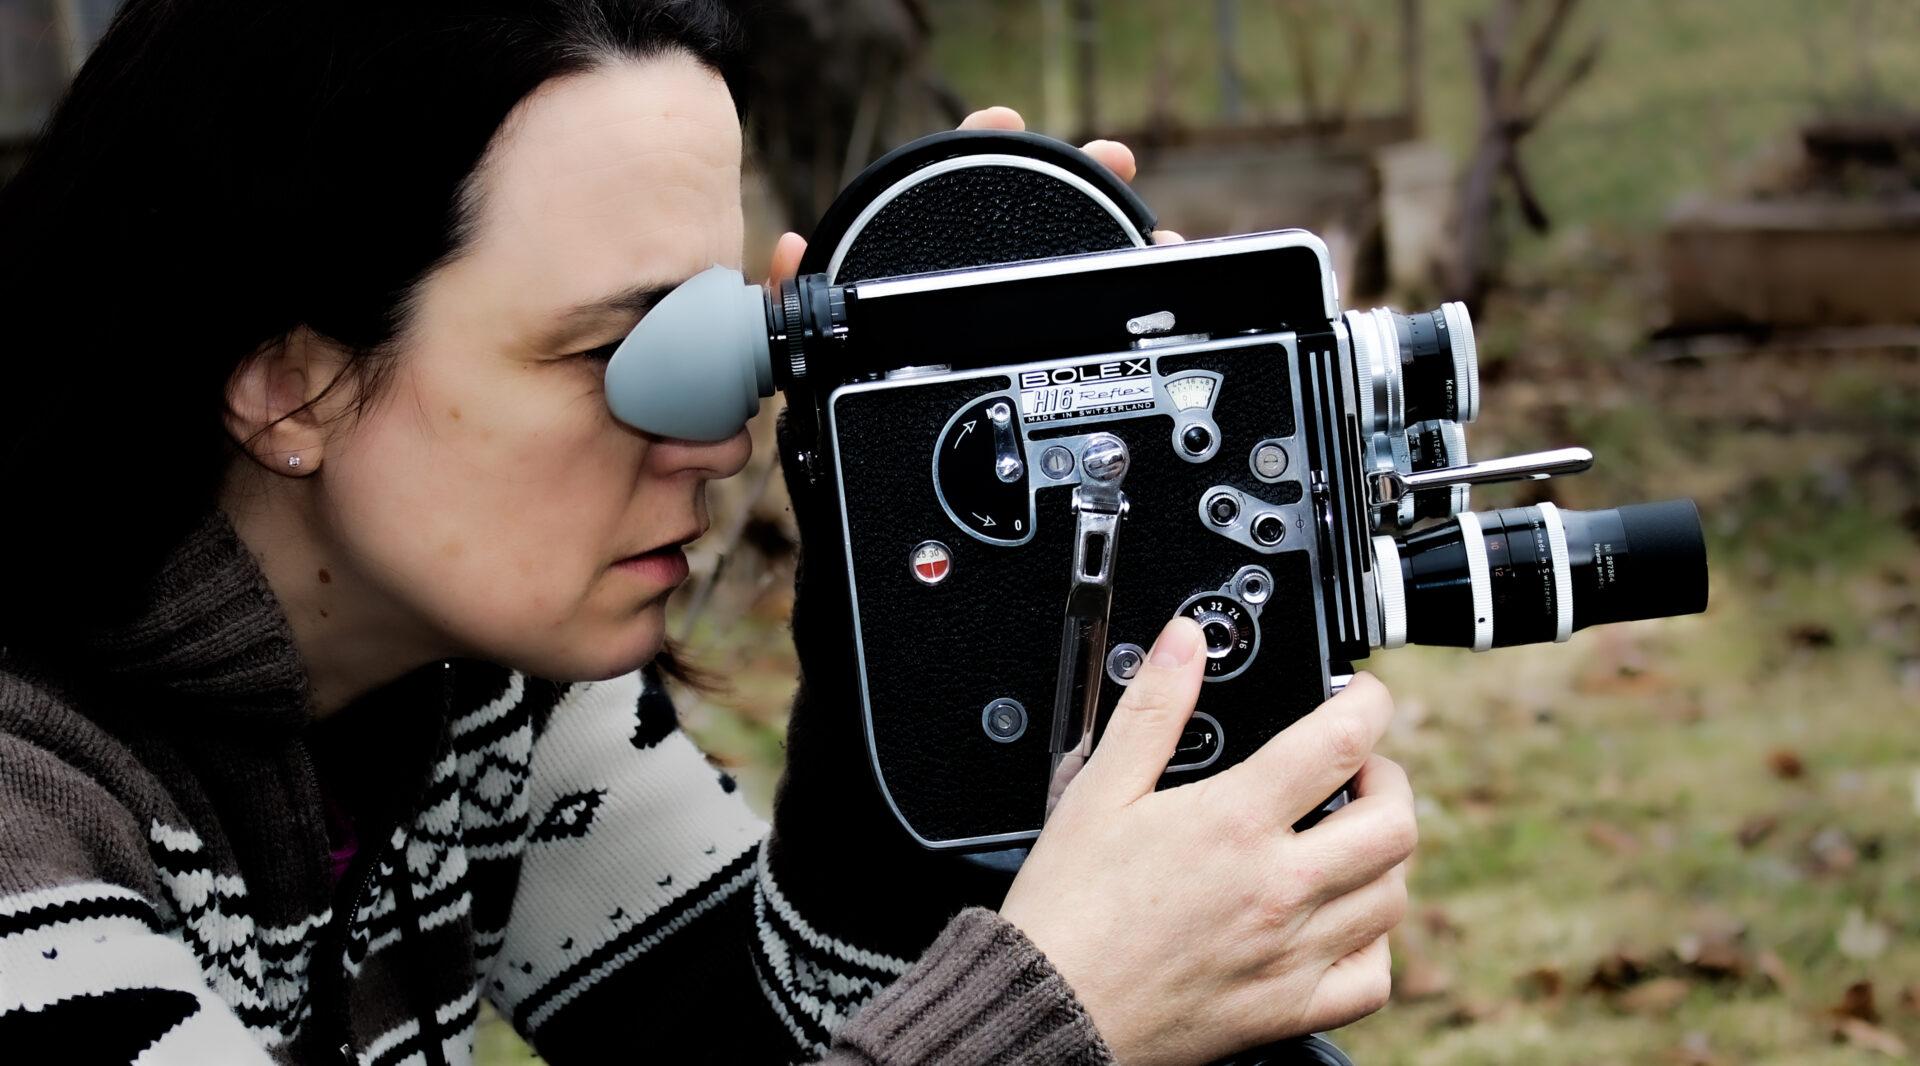 La réalisatrice Nicole Blundell